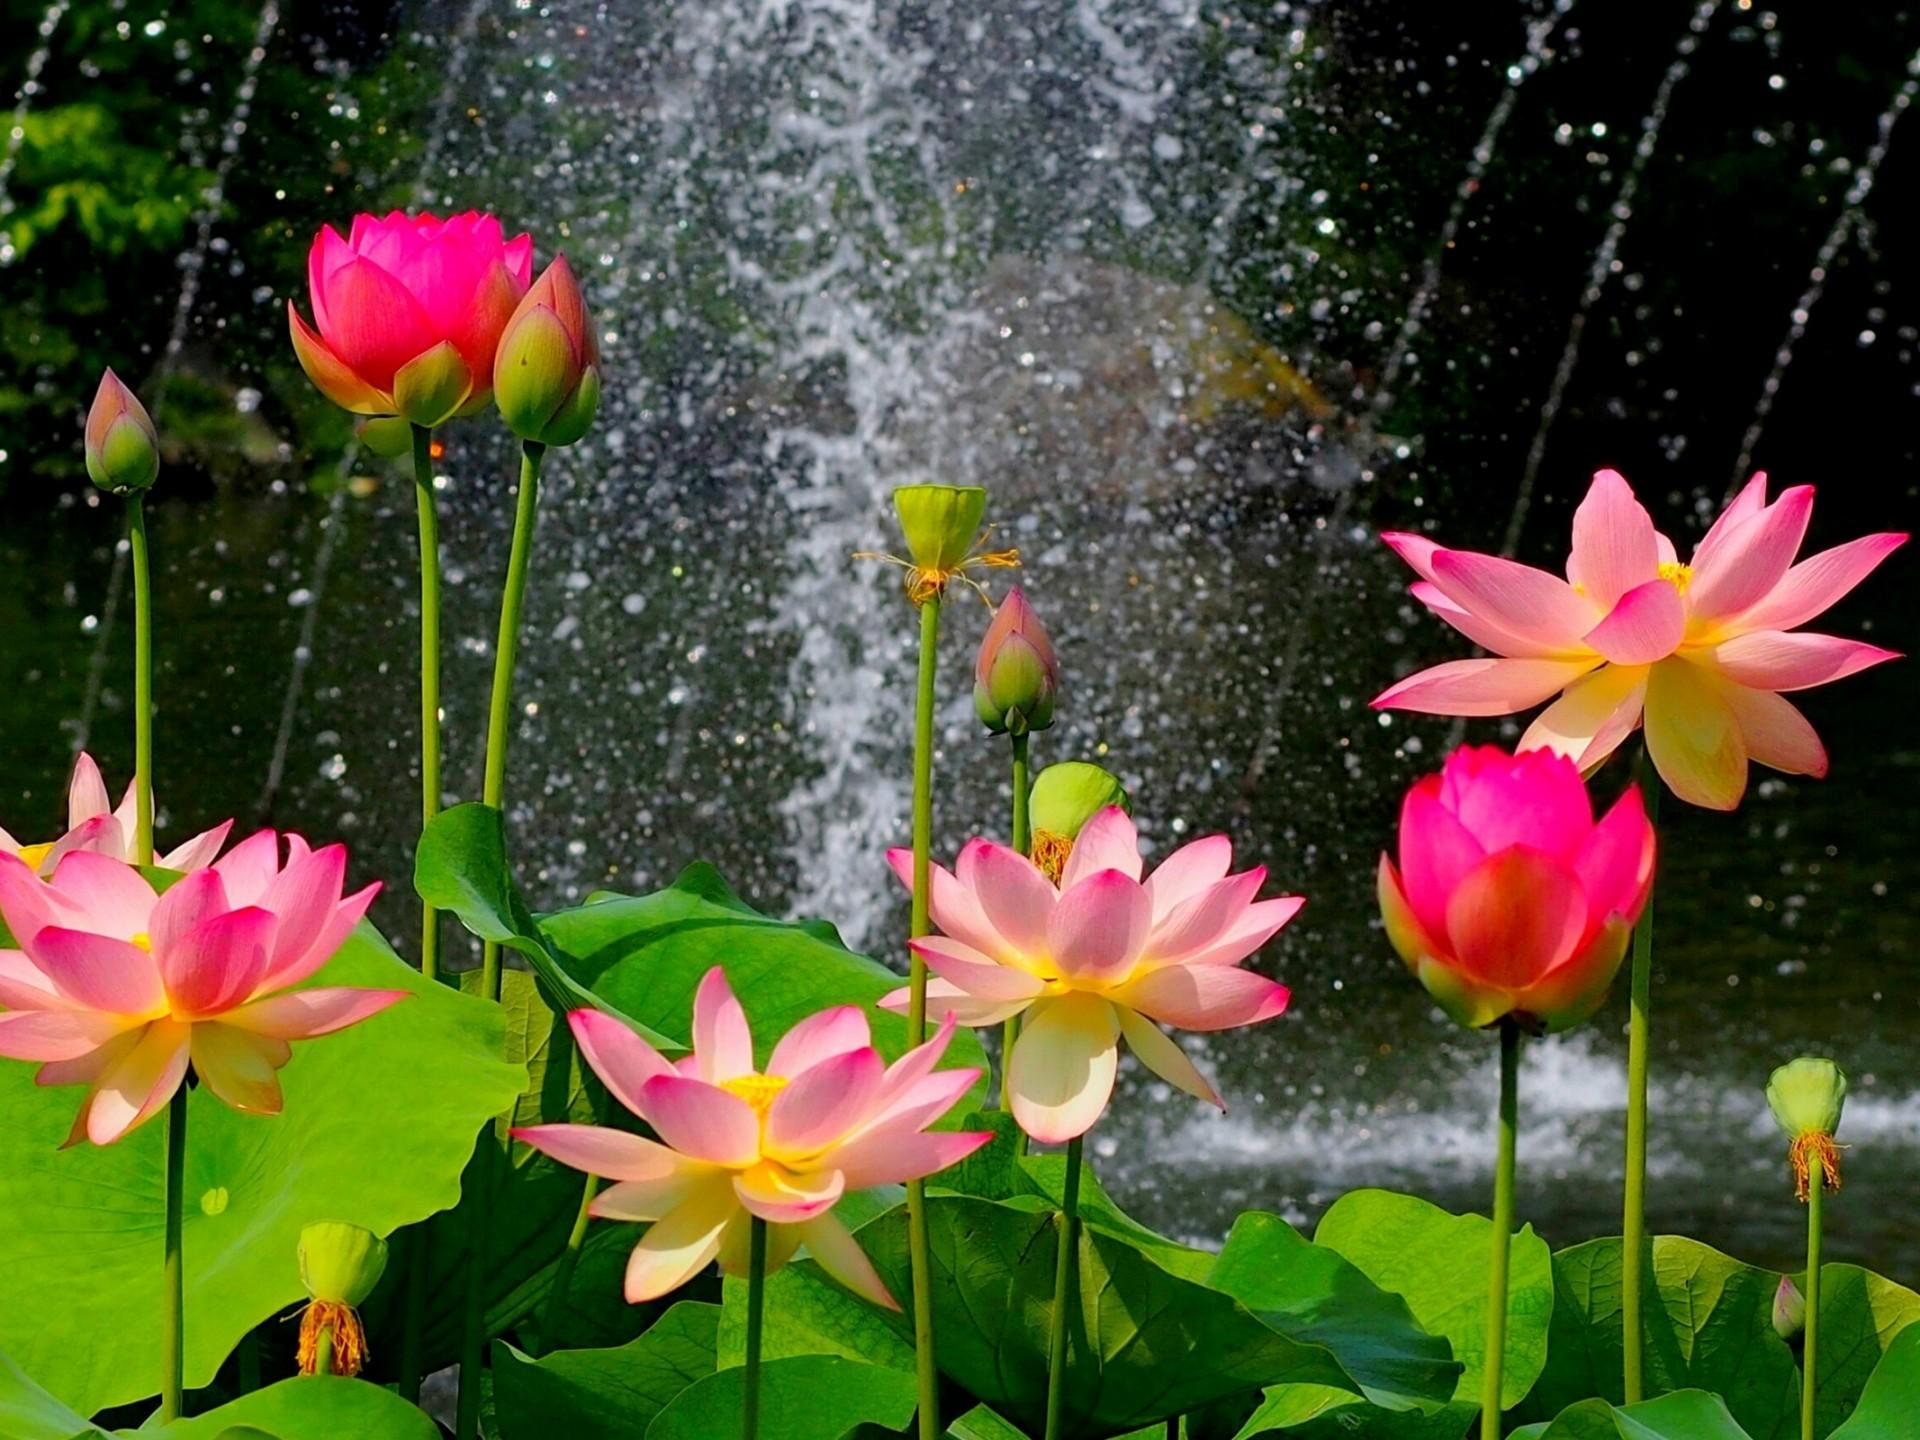 Lotus flower background 54 images 1920x1200 black lotus flower wallpapers high resolution izmirmasajfo Choice Image